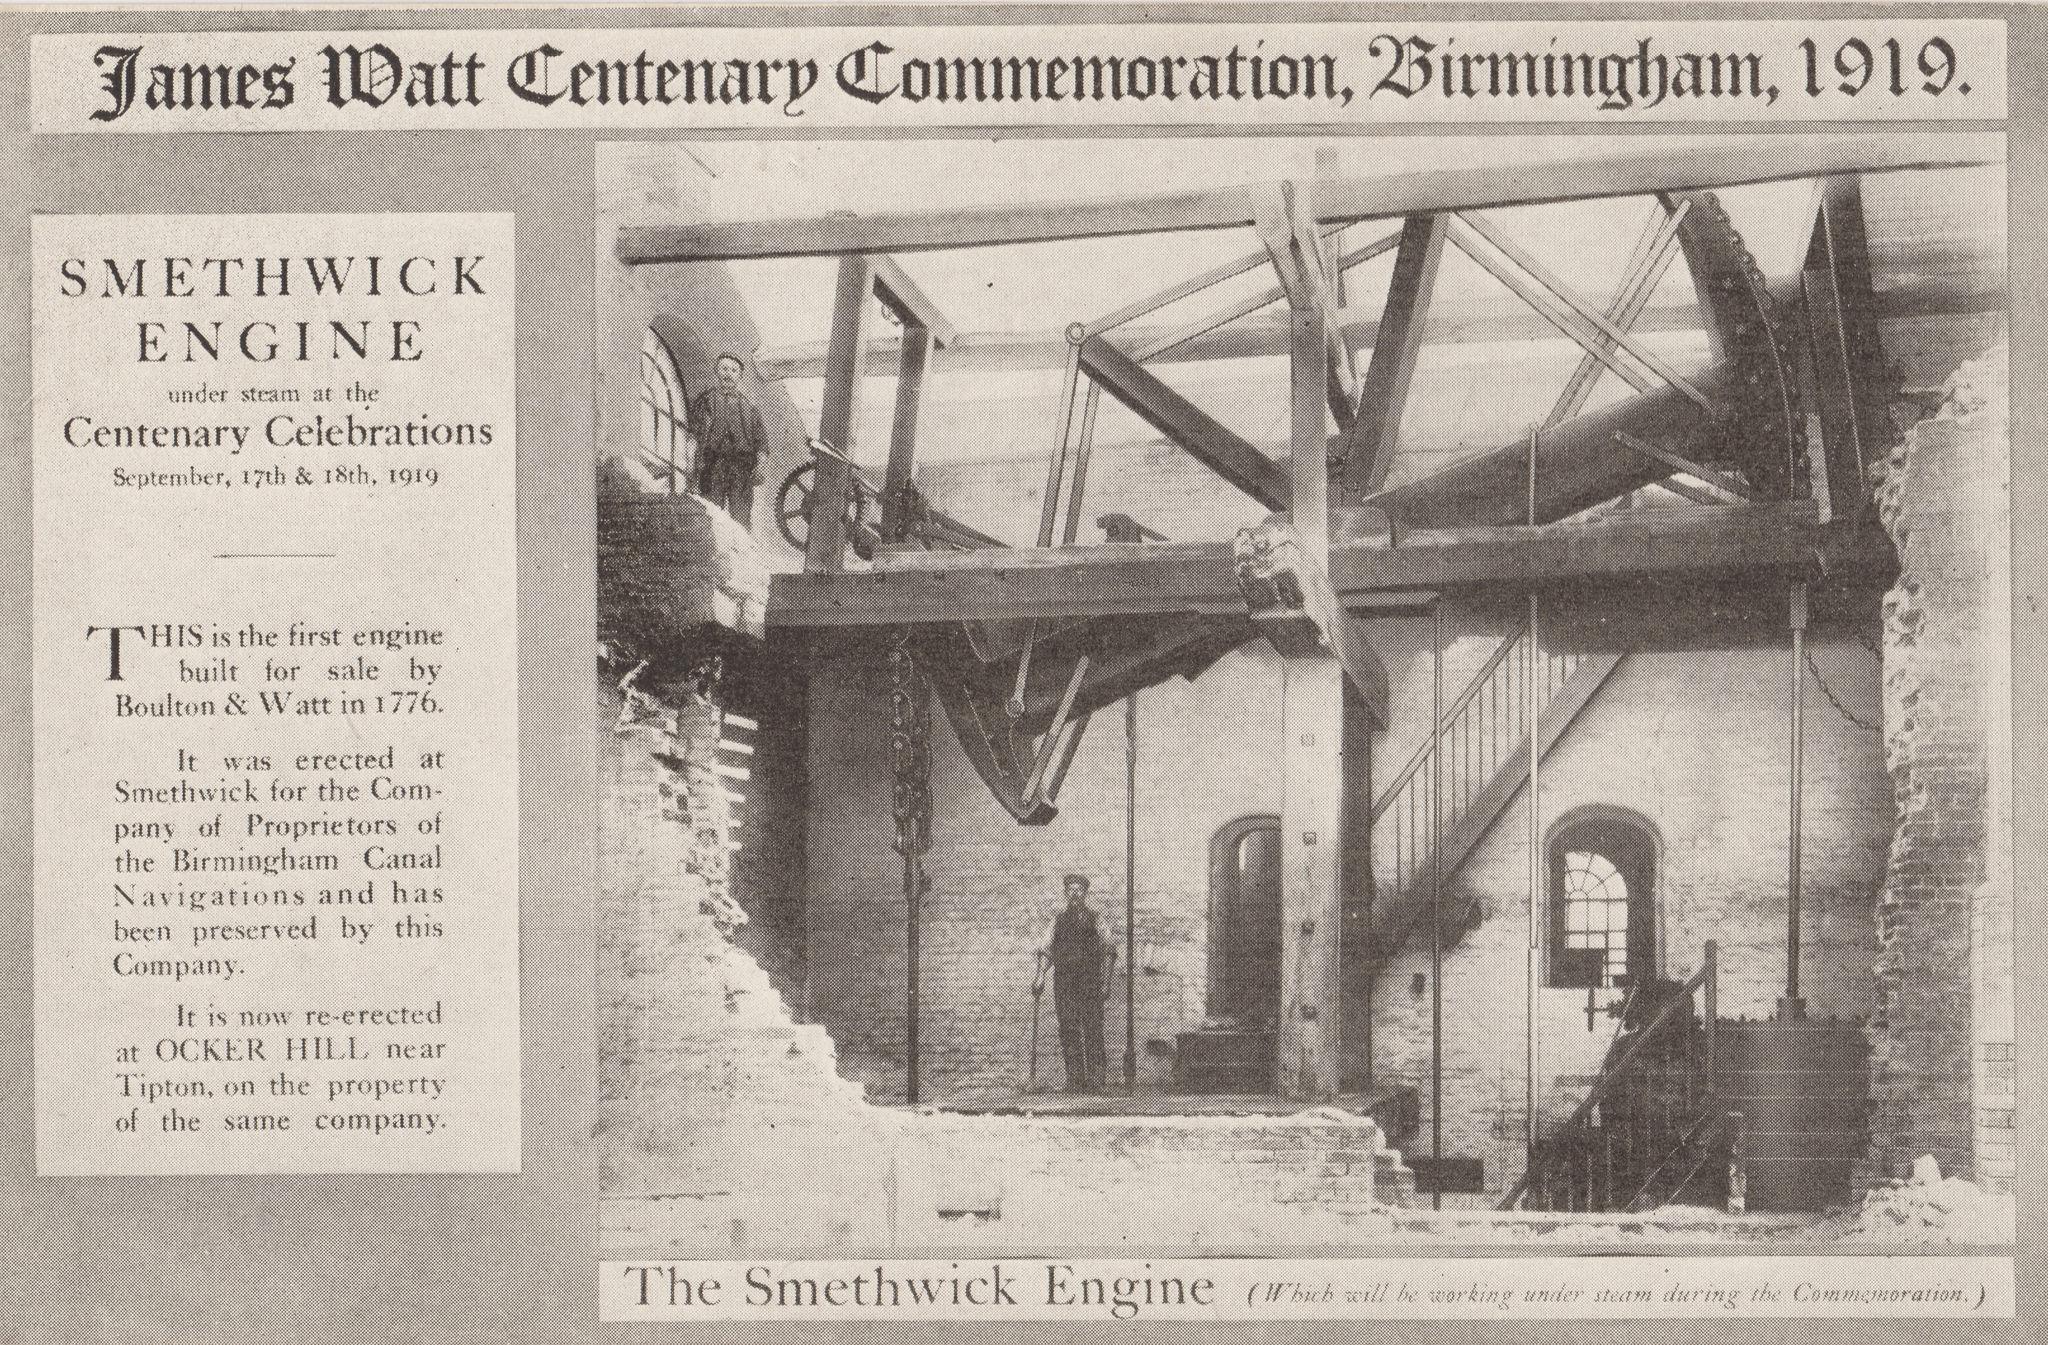 Smethwick Engine